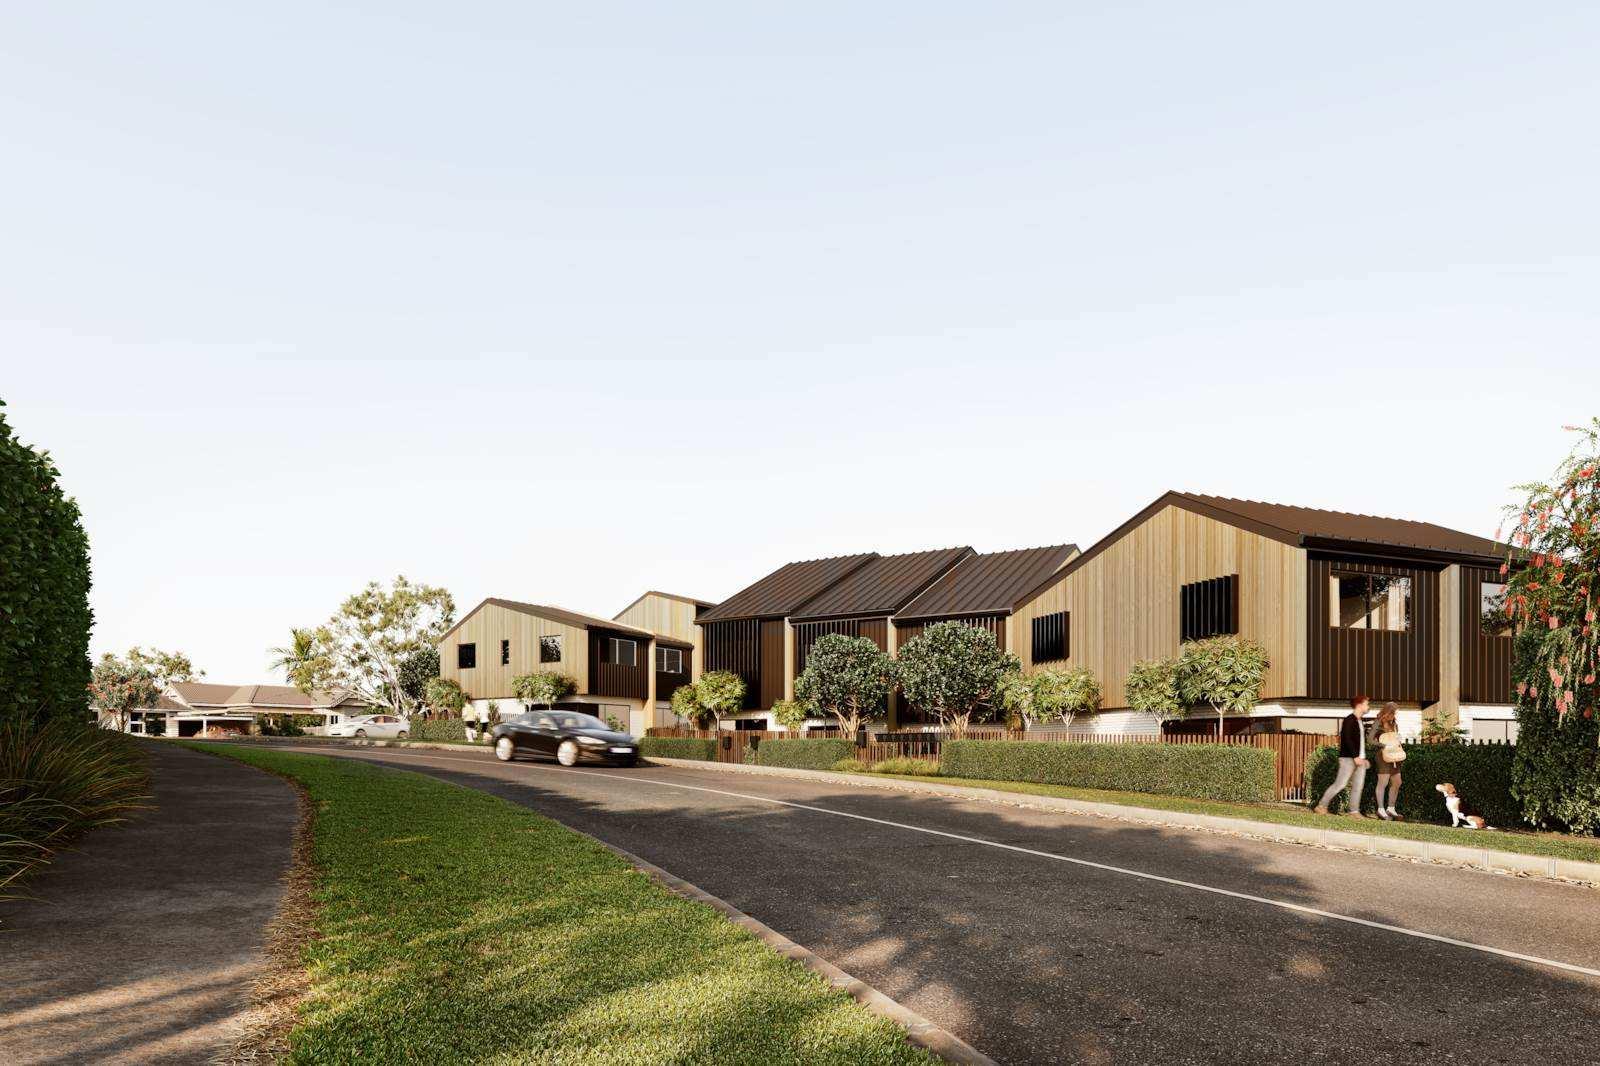 Glendowie 3房 17套全新城市屋 多种户型选择 学区&交通双优 咫尺海滩 首付仅需10%! 17 Brand New Townhouses